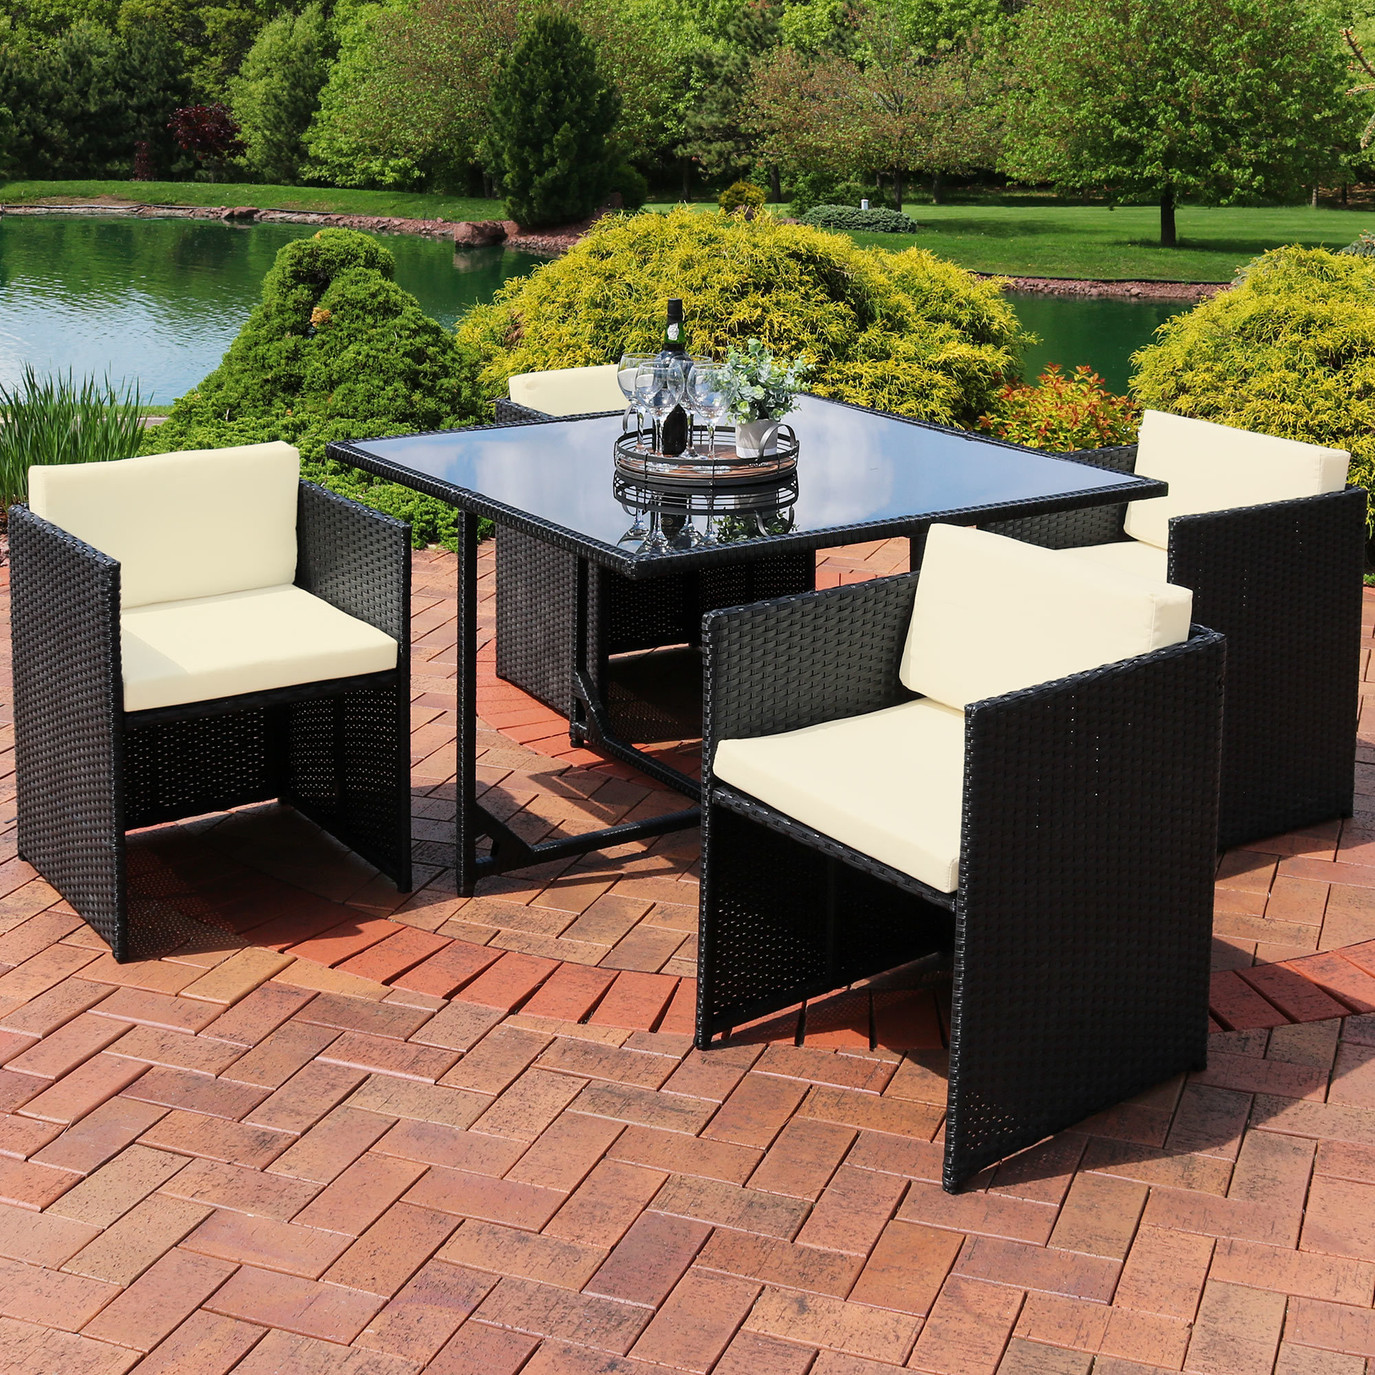 Patio Living Plus Coupon: Outdoor Patio And Garden Décor Accents